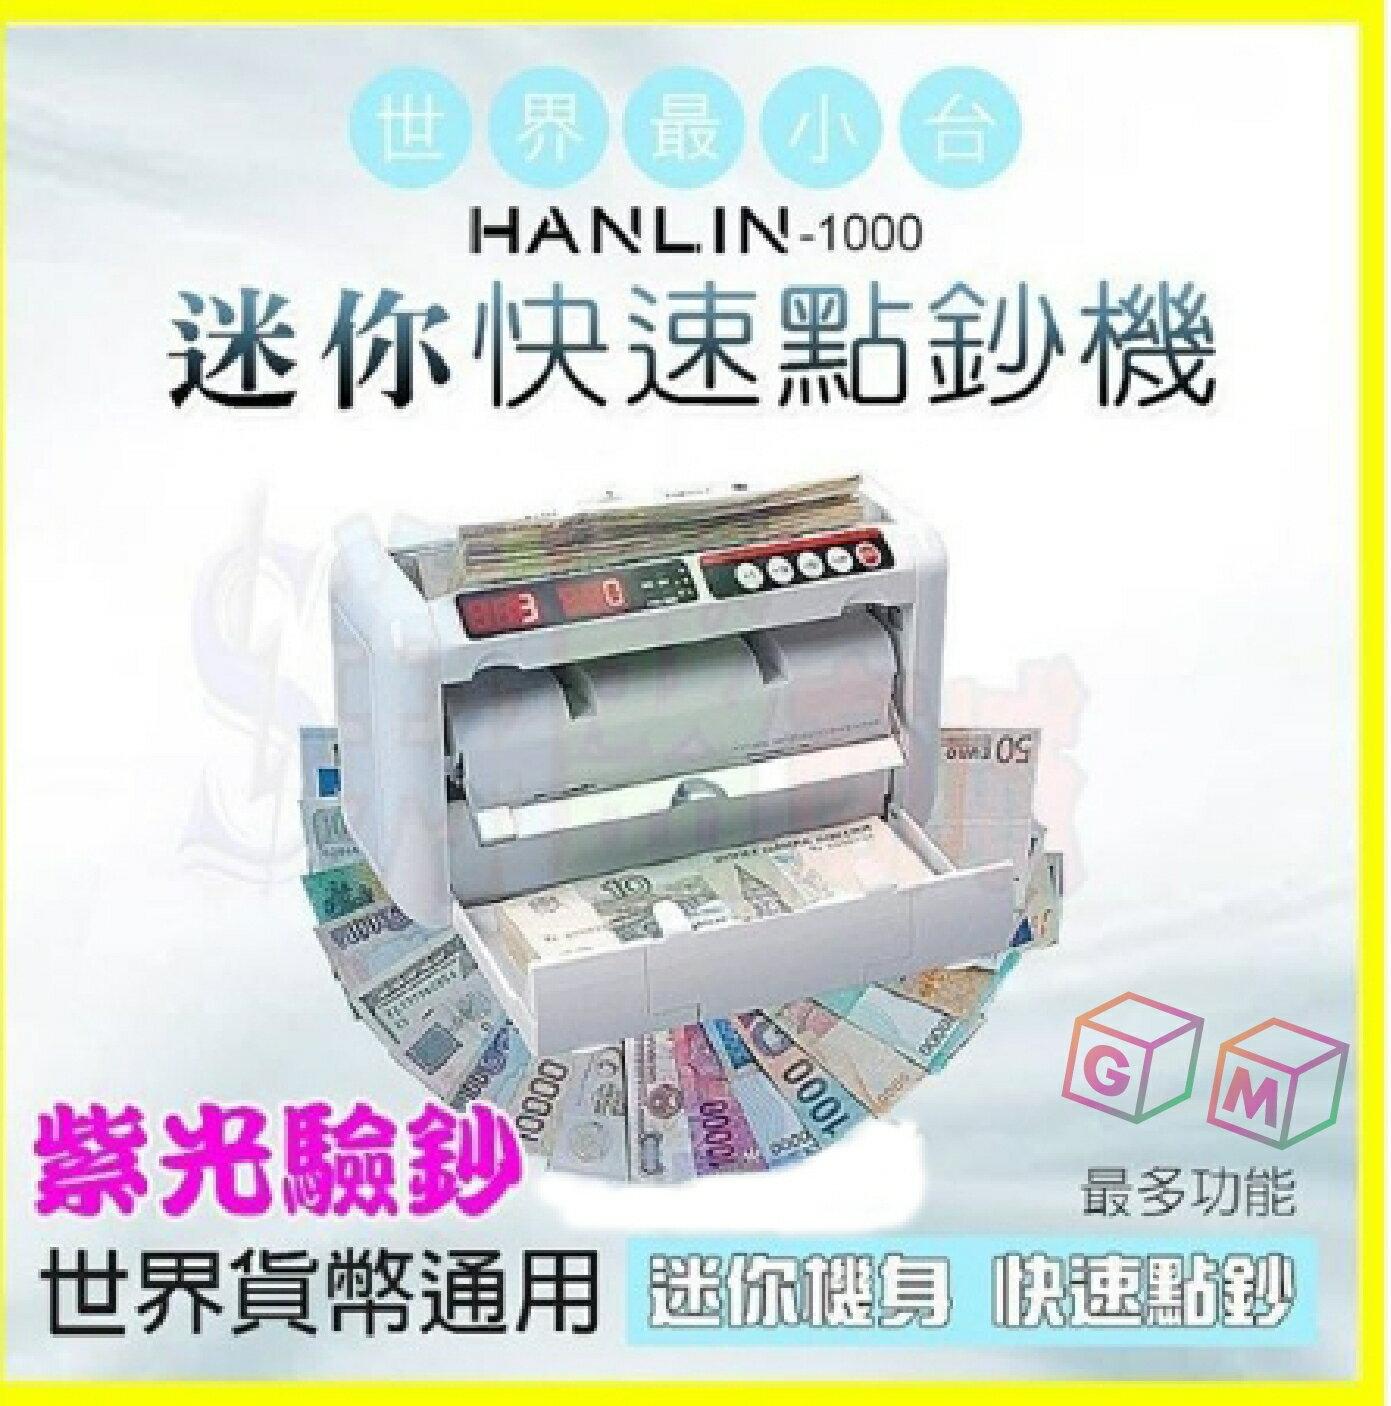 GM數位生活館🏆紫光驗鈔 迷你快速點鈔機 世界貨幣通用 可隨身攜帶 多功能合一 點鈔機 驗鈔機 高達100張